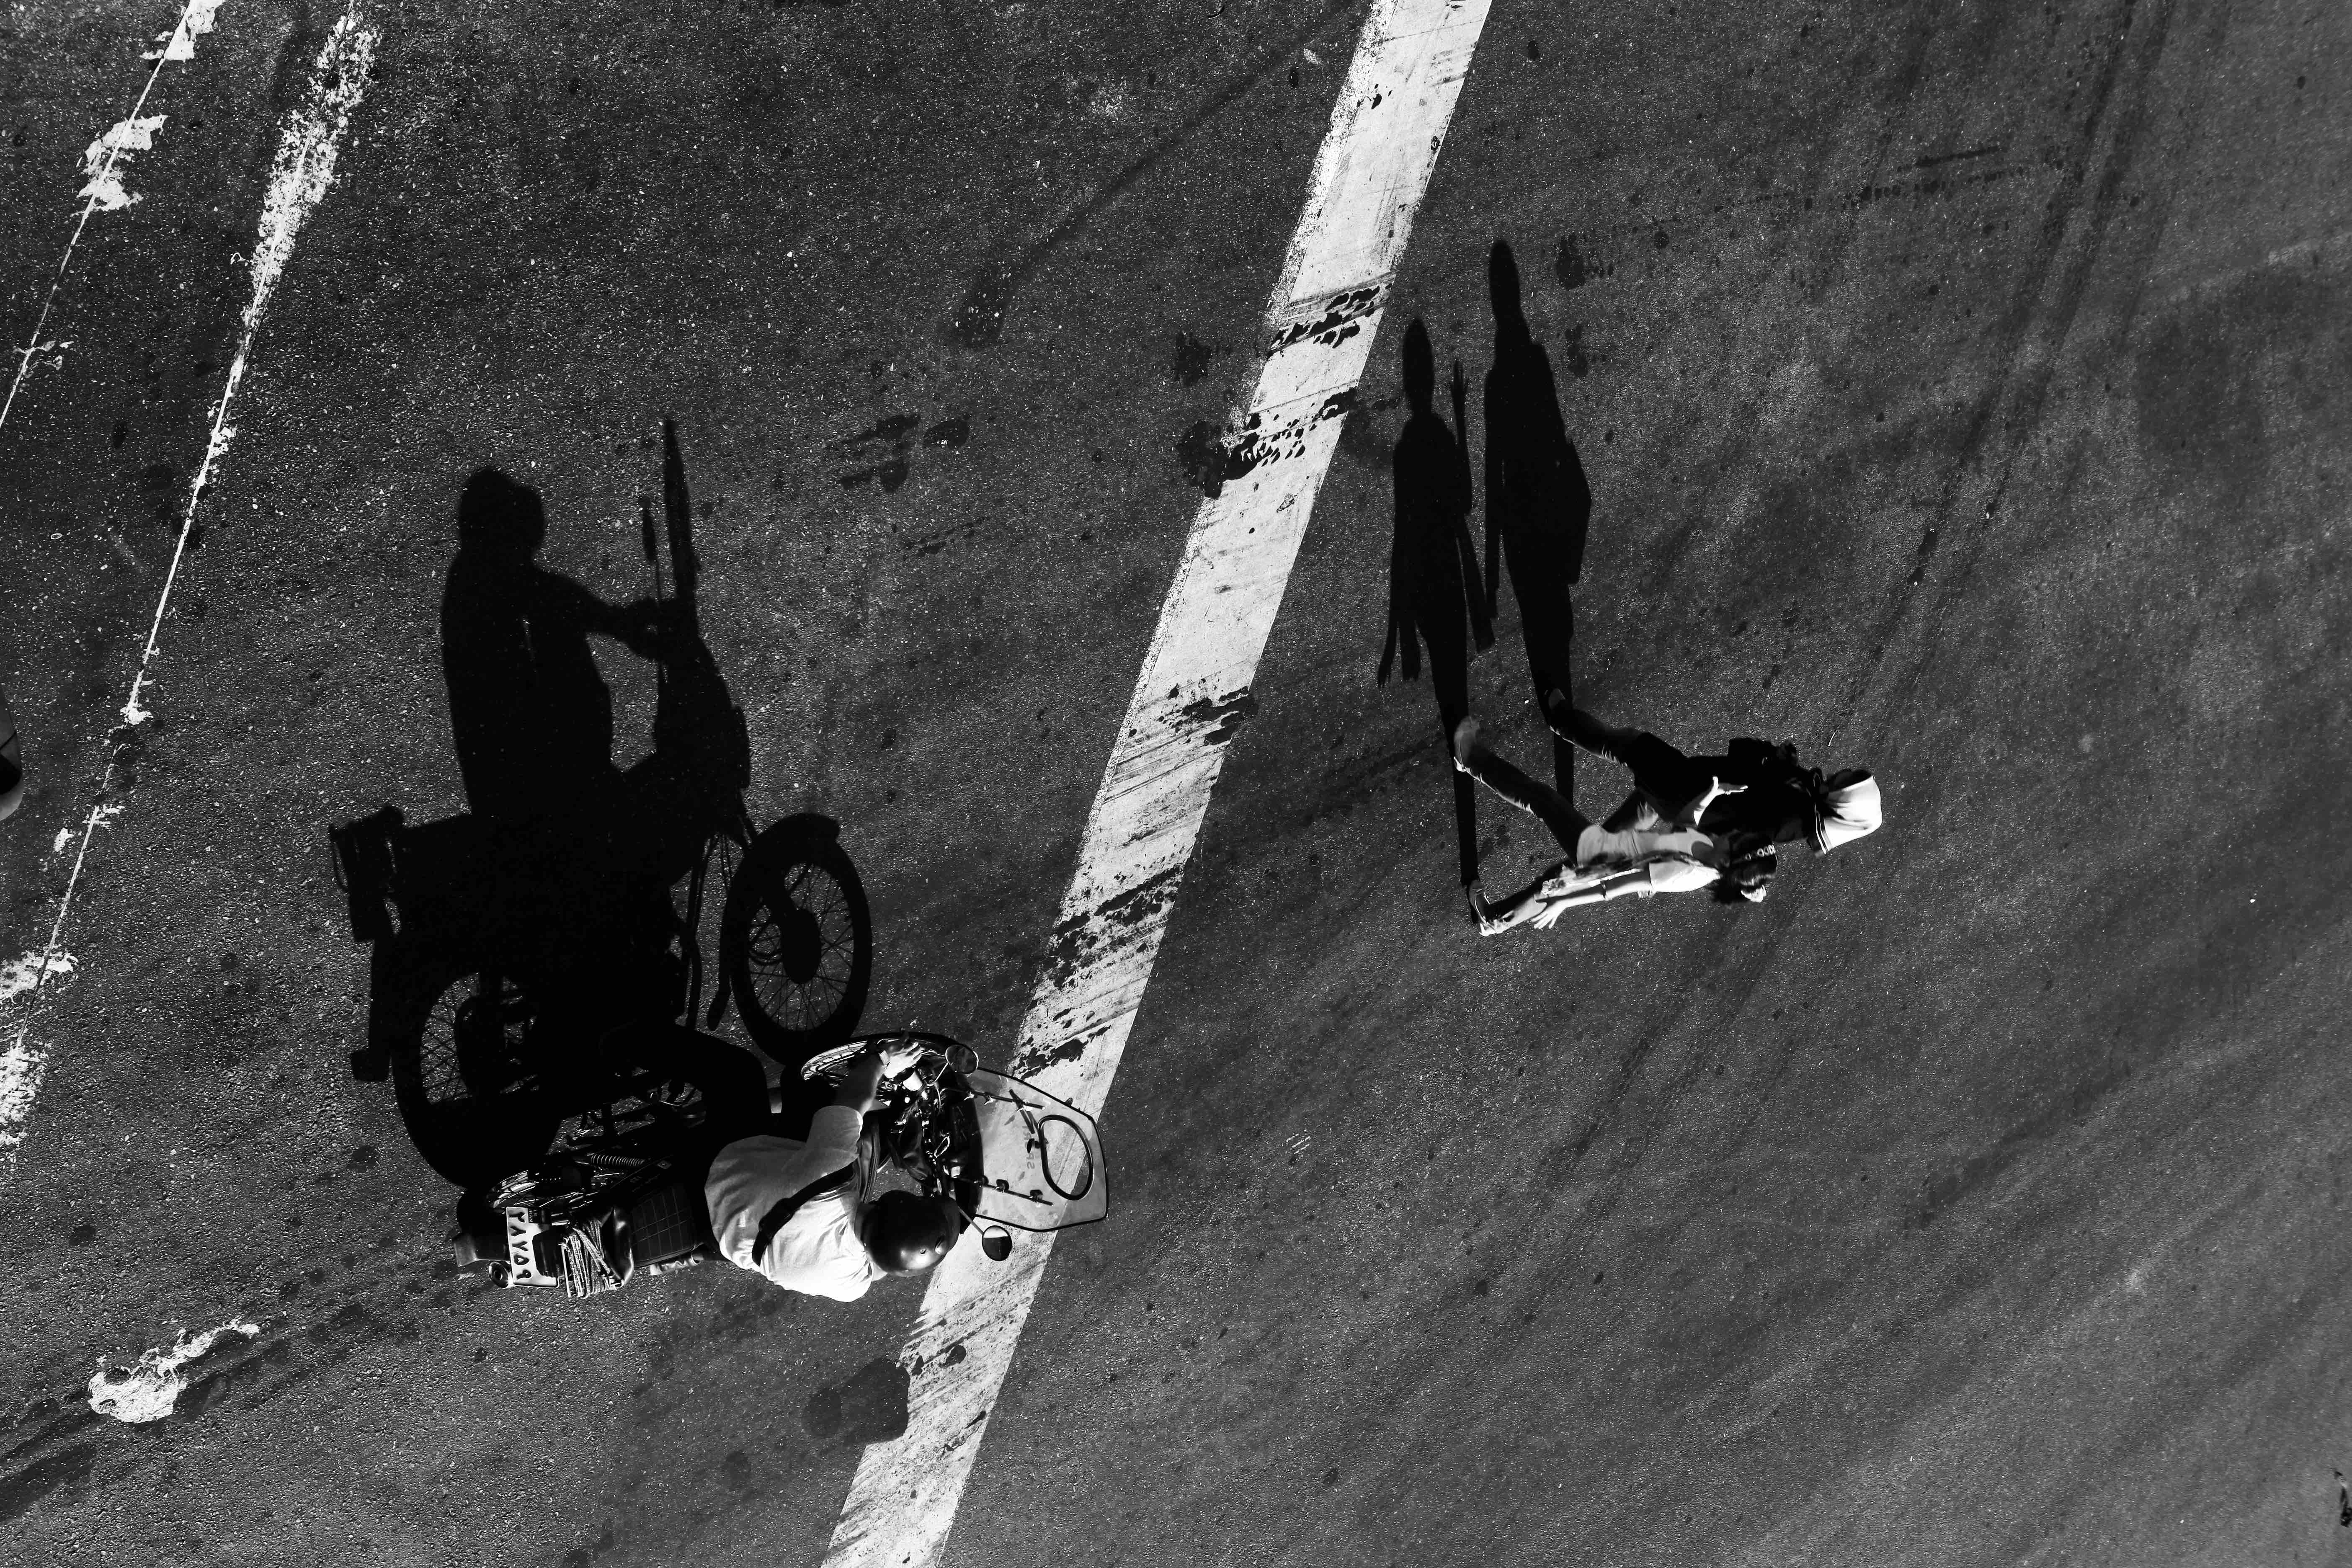 Untitled (23)_ The Life Of Shadows Series - Nehdaran_ Dana